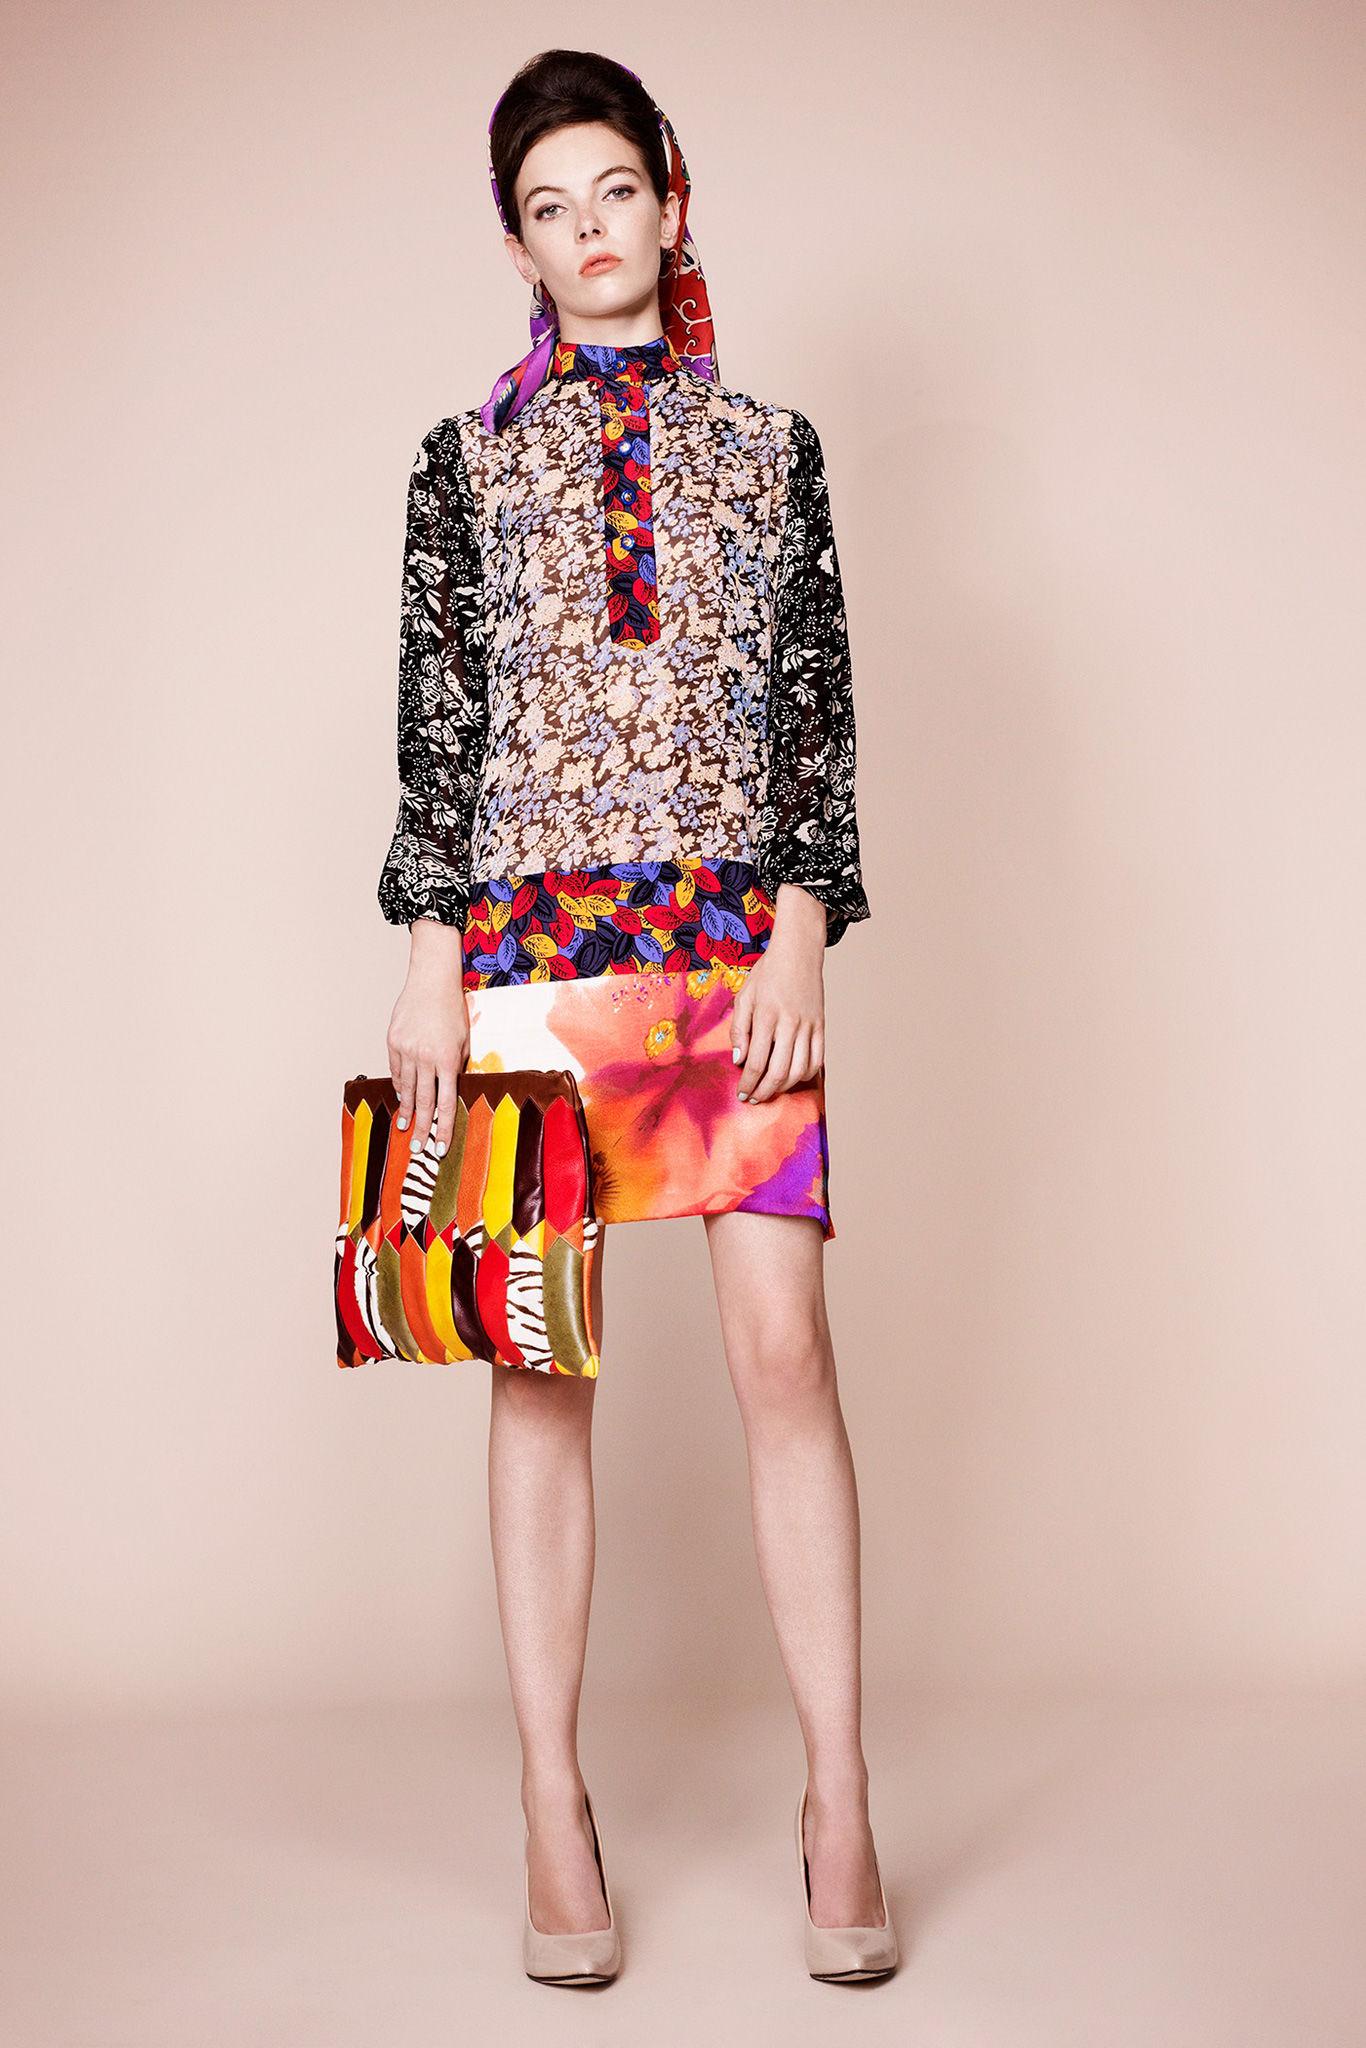 https://i1.wp.com/fashionbombdaily.com/wp-content/uploads/2012/09/duro-olowu-spring-2013-7.jpg